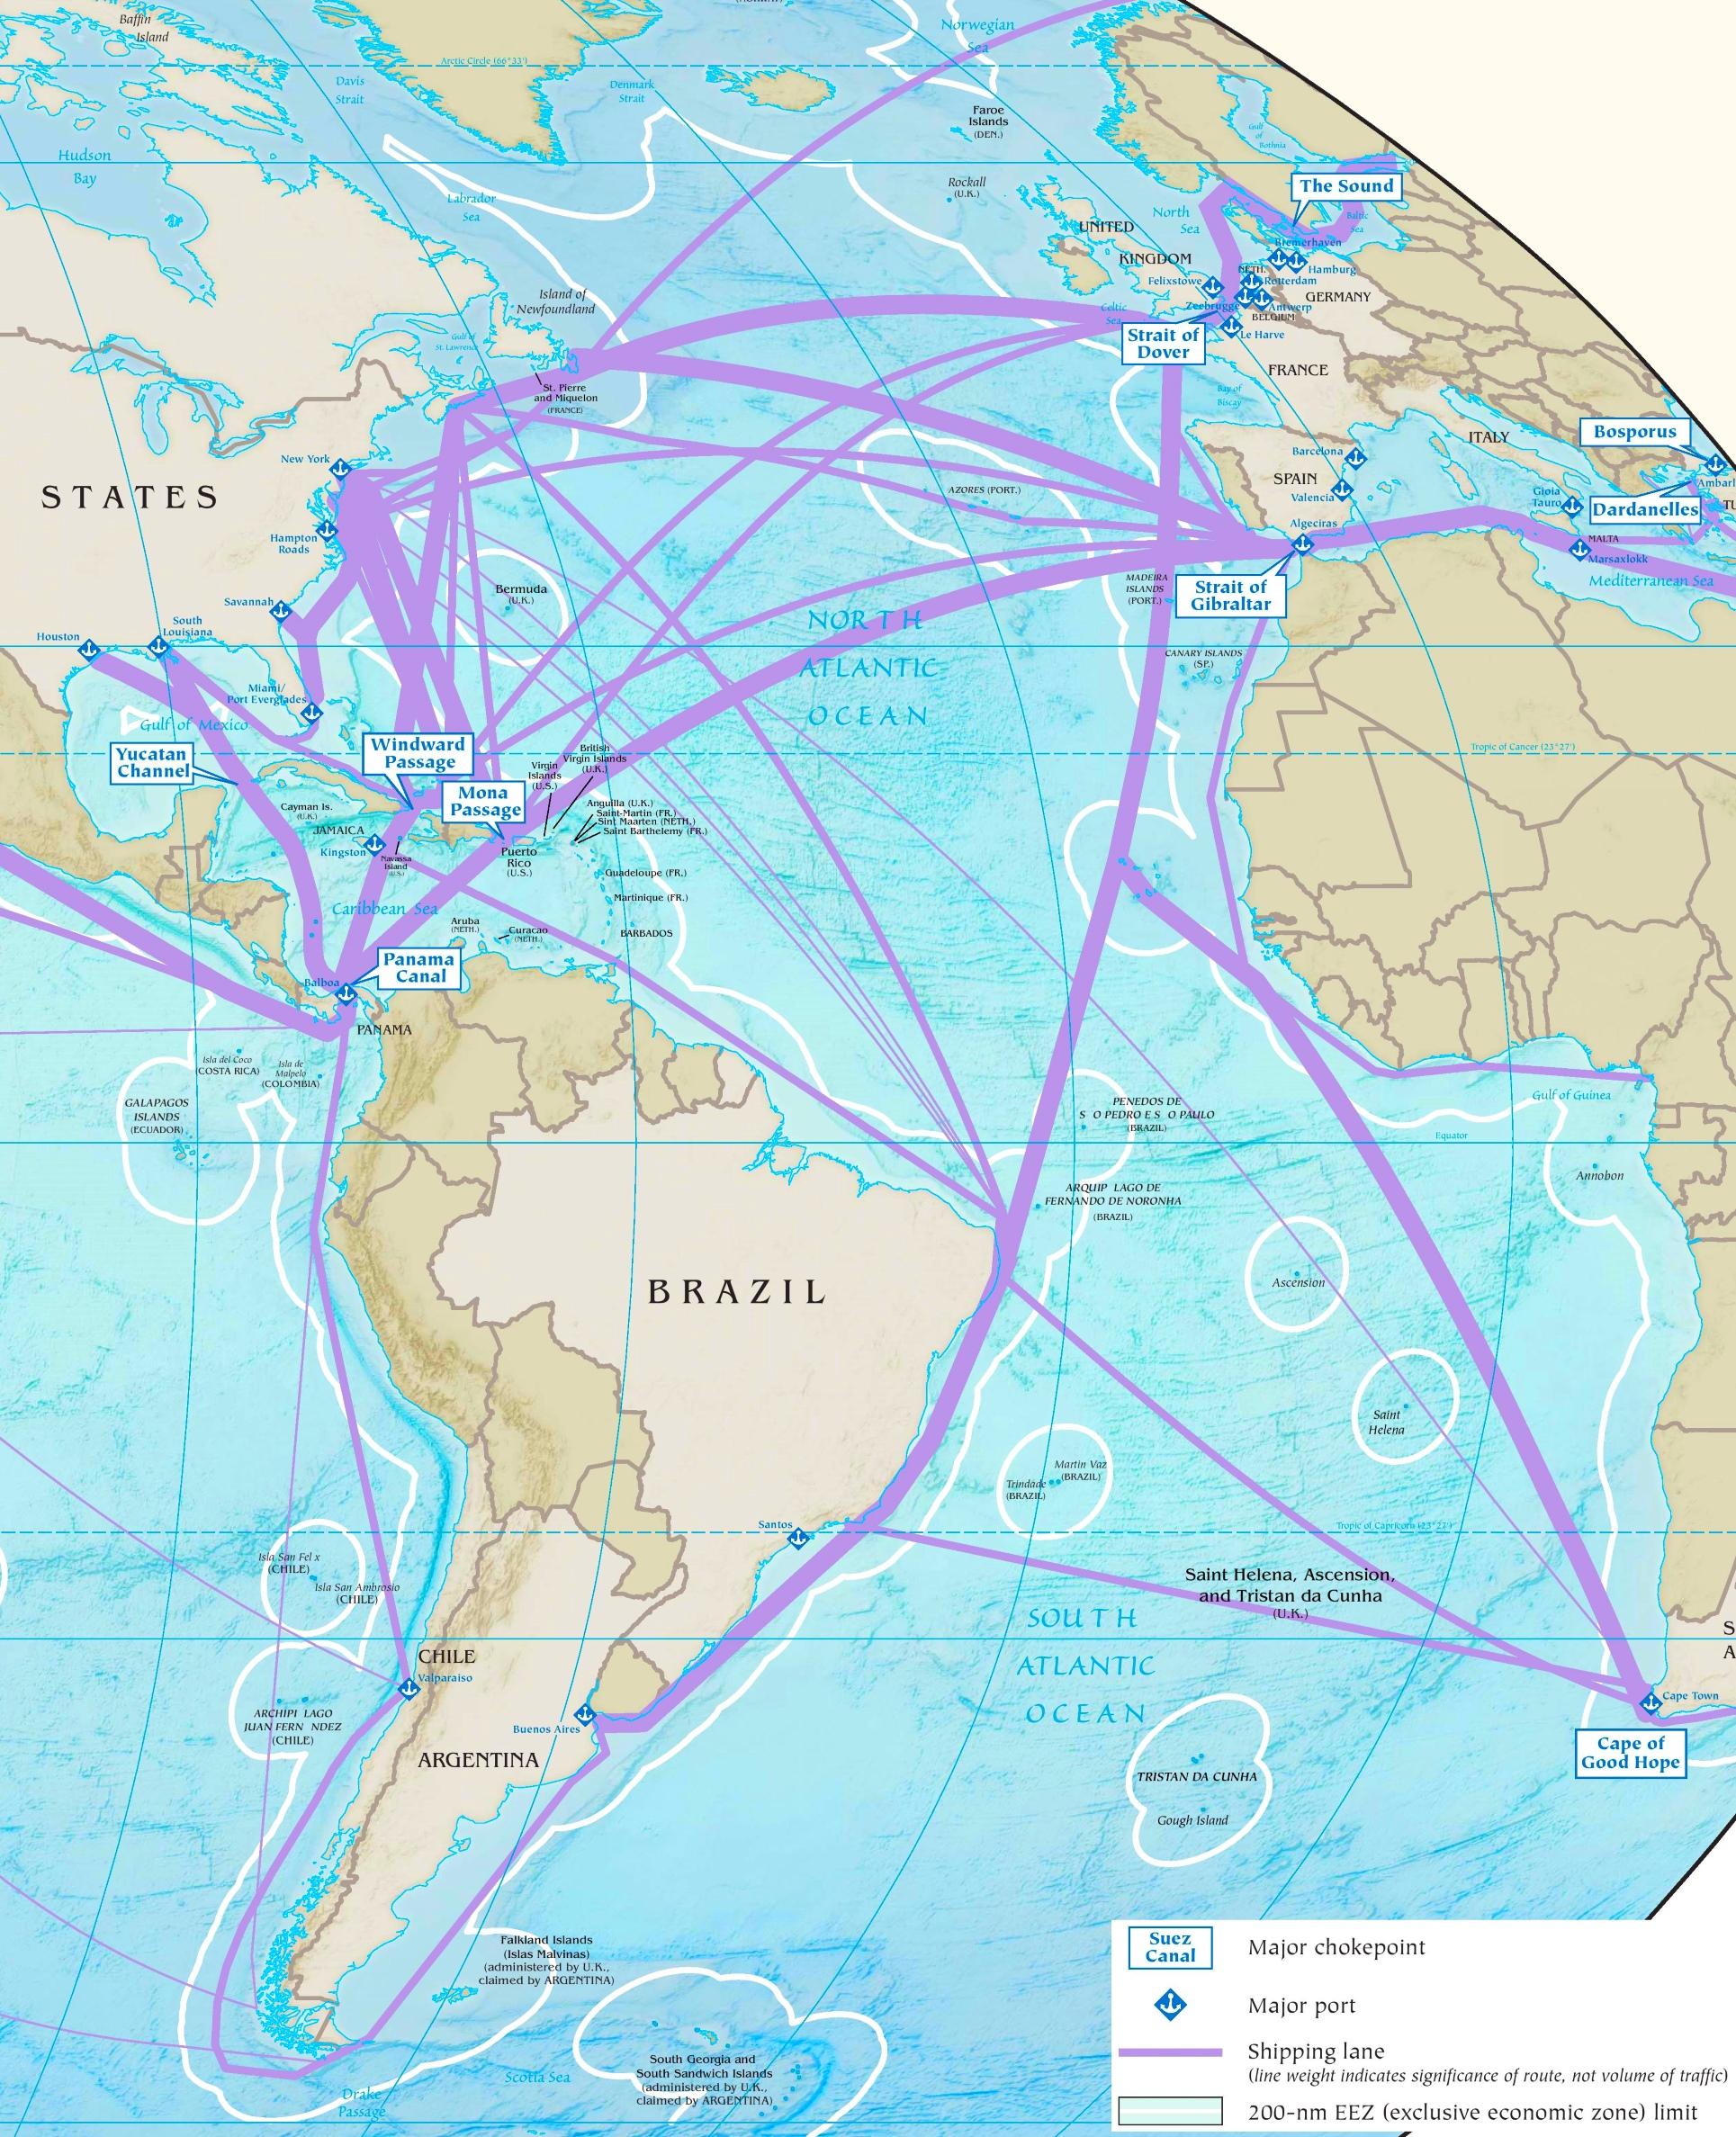 Atlantic Ocean Maps | Maps of Atlantic Ocean on usa rail map, usa airports map, usa road map,